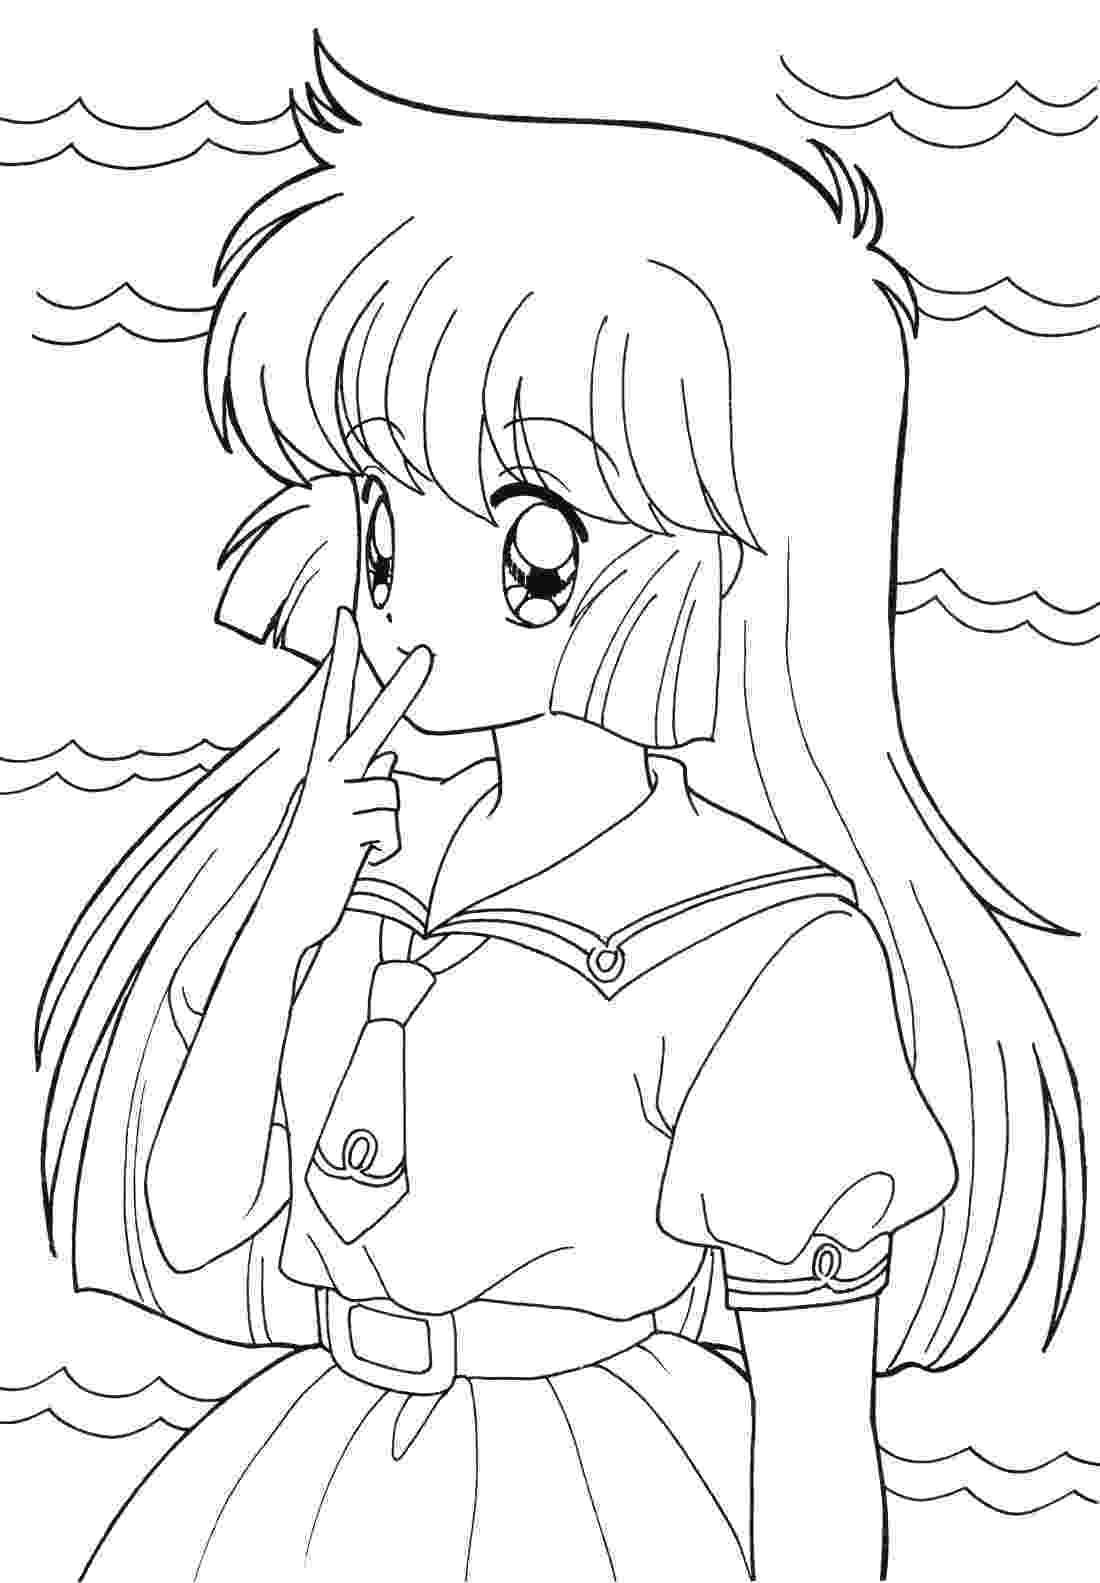 anime girl coloring sheets anime coloring pages best coloring pages for kids coloring girl anime sheets